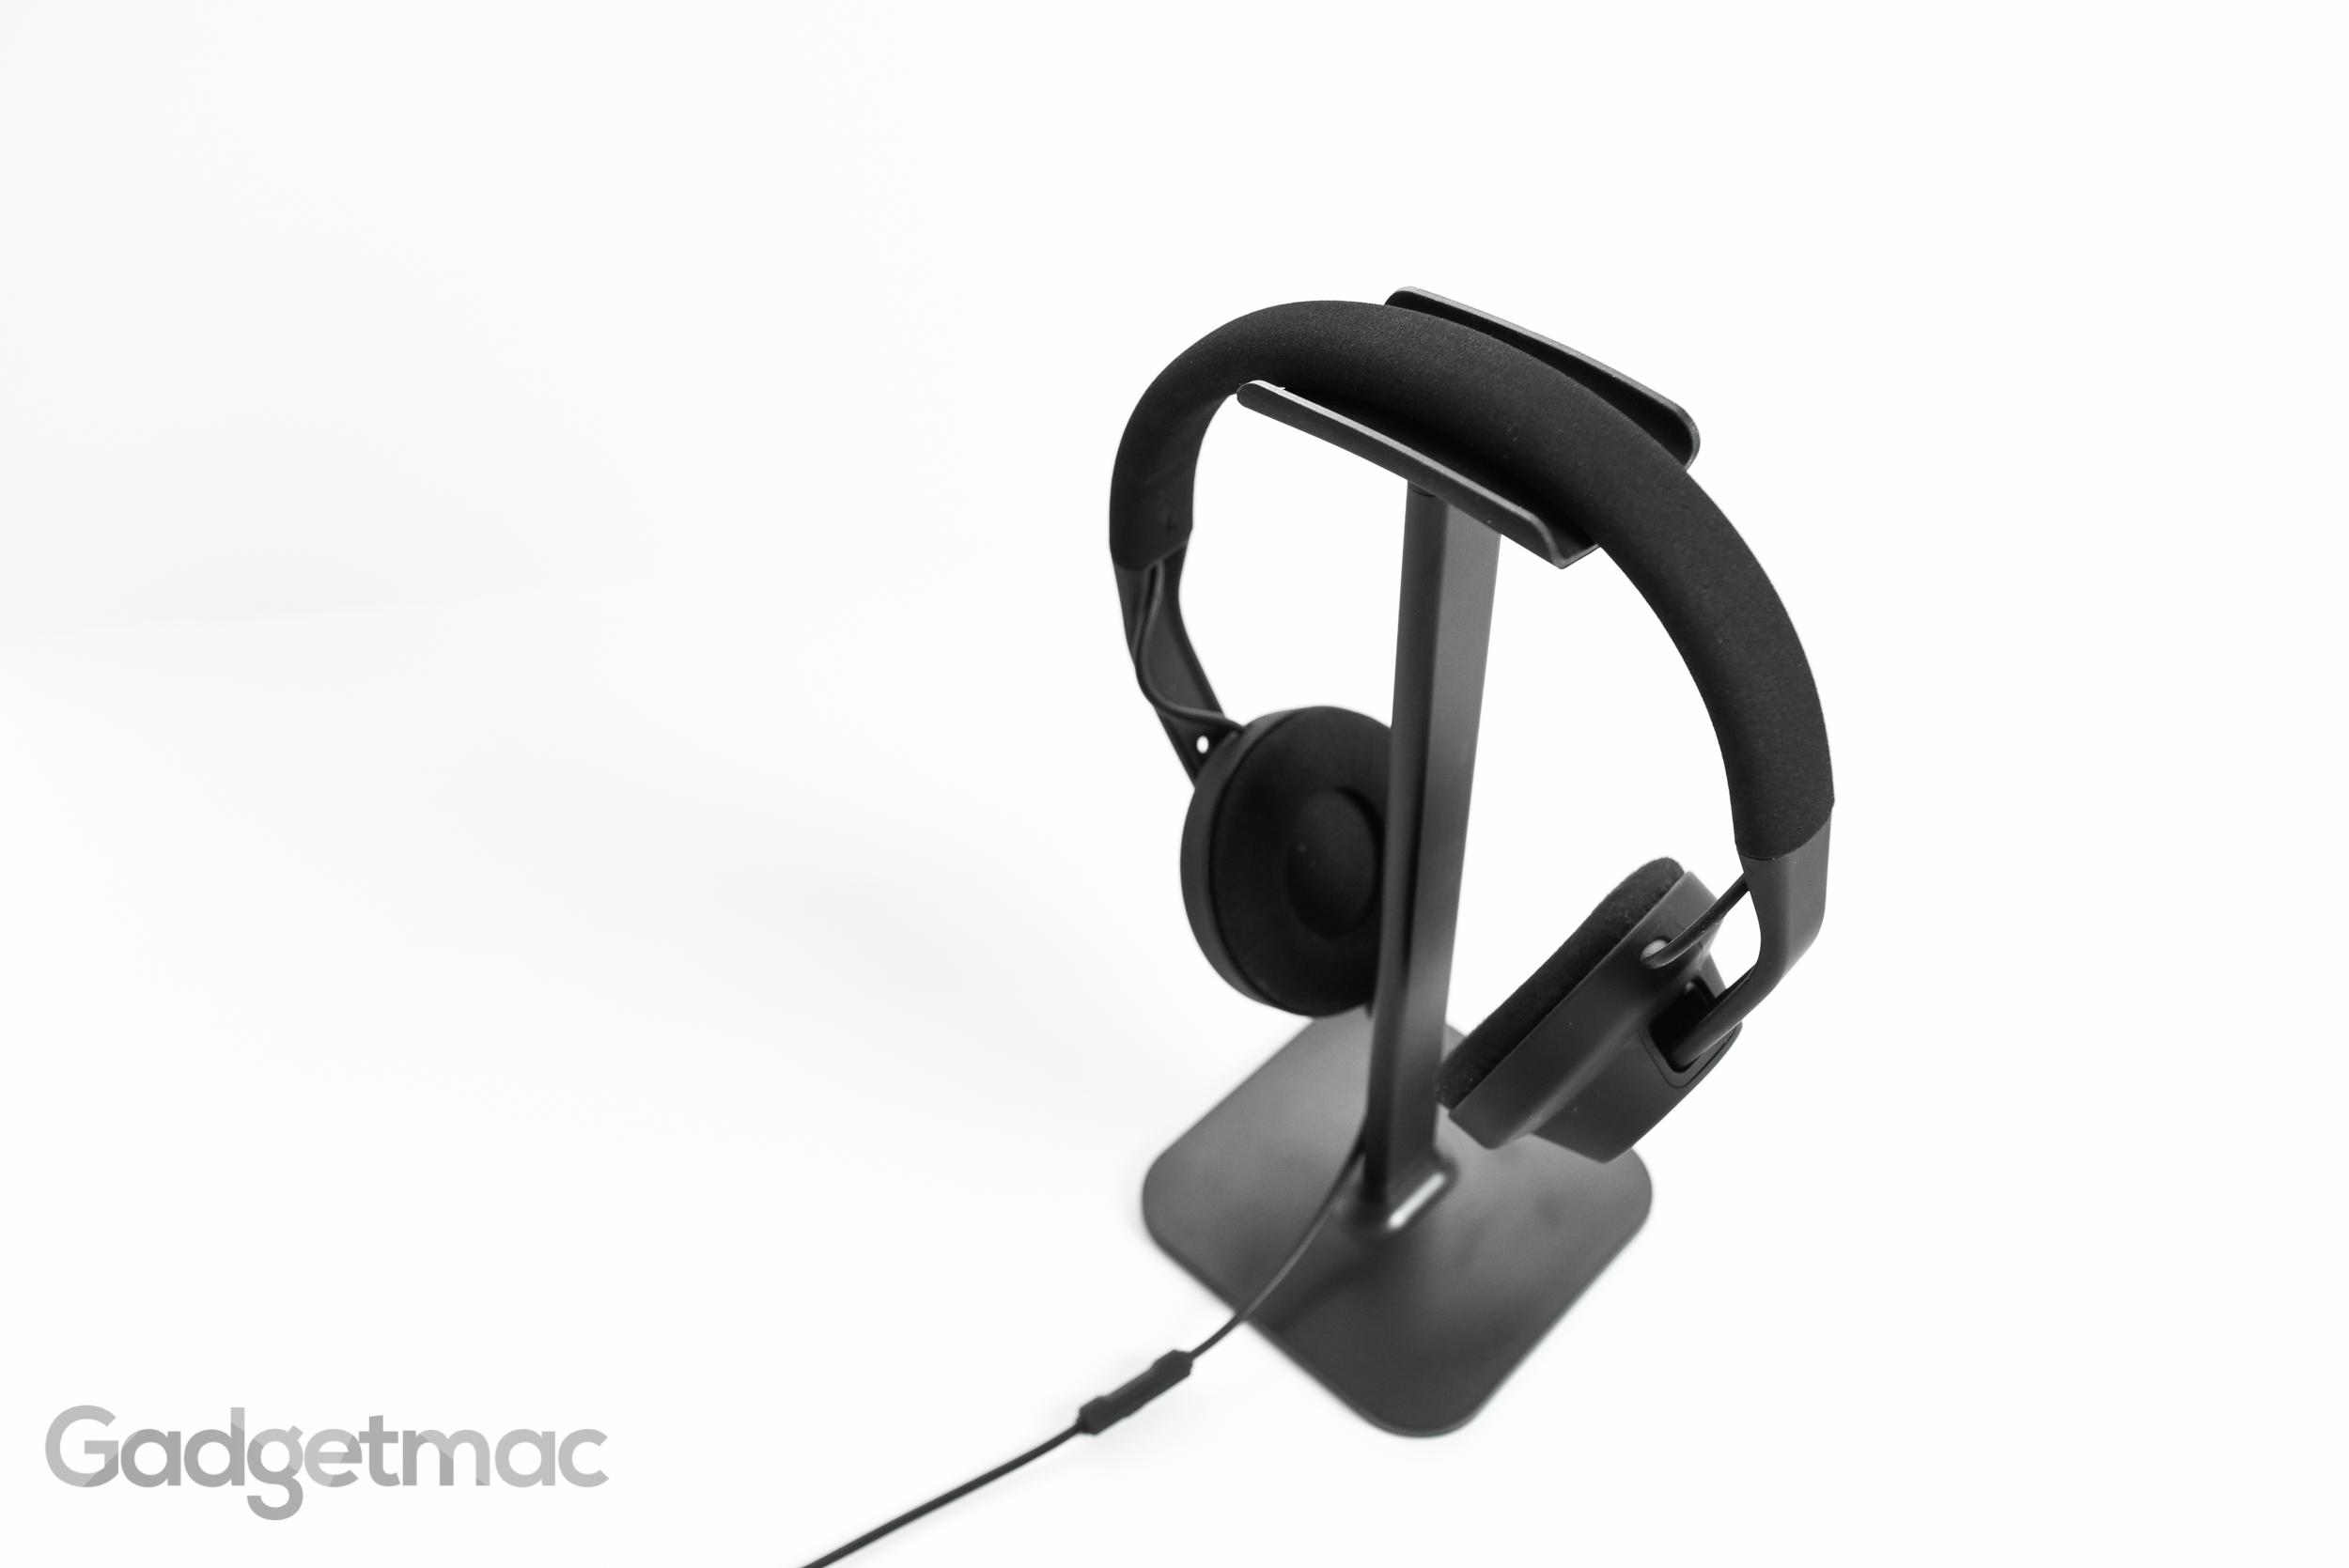 bluelounge_posto_headphone_stand_1.jpg